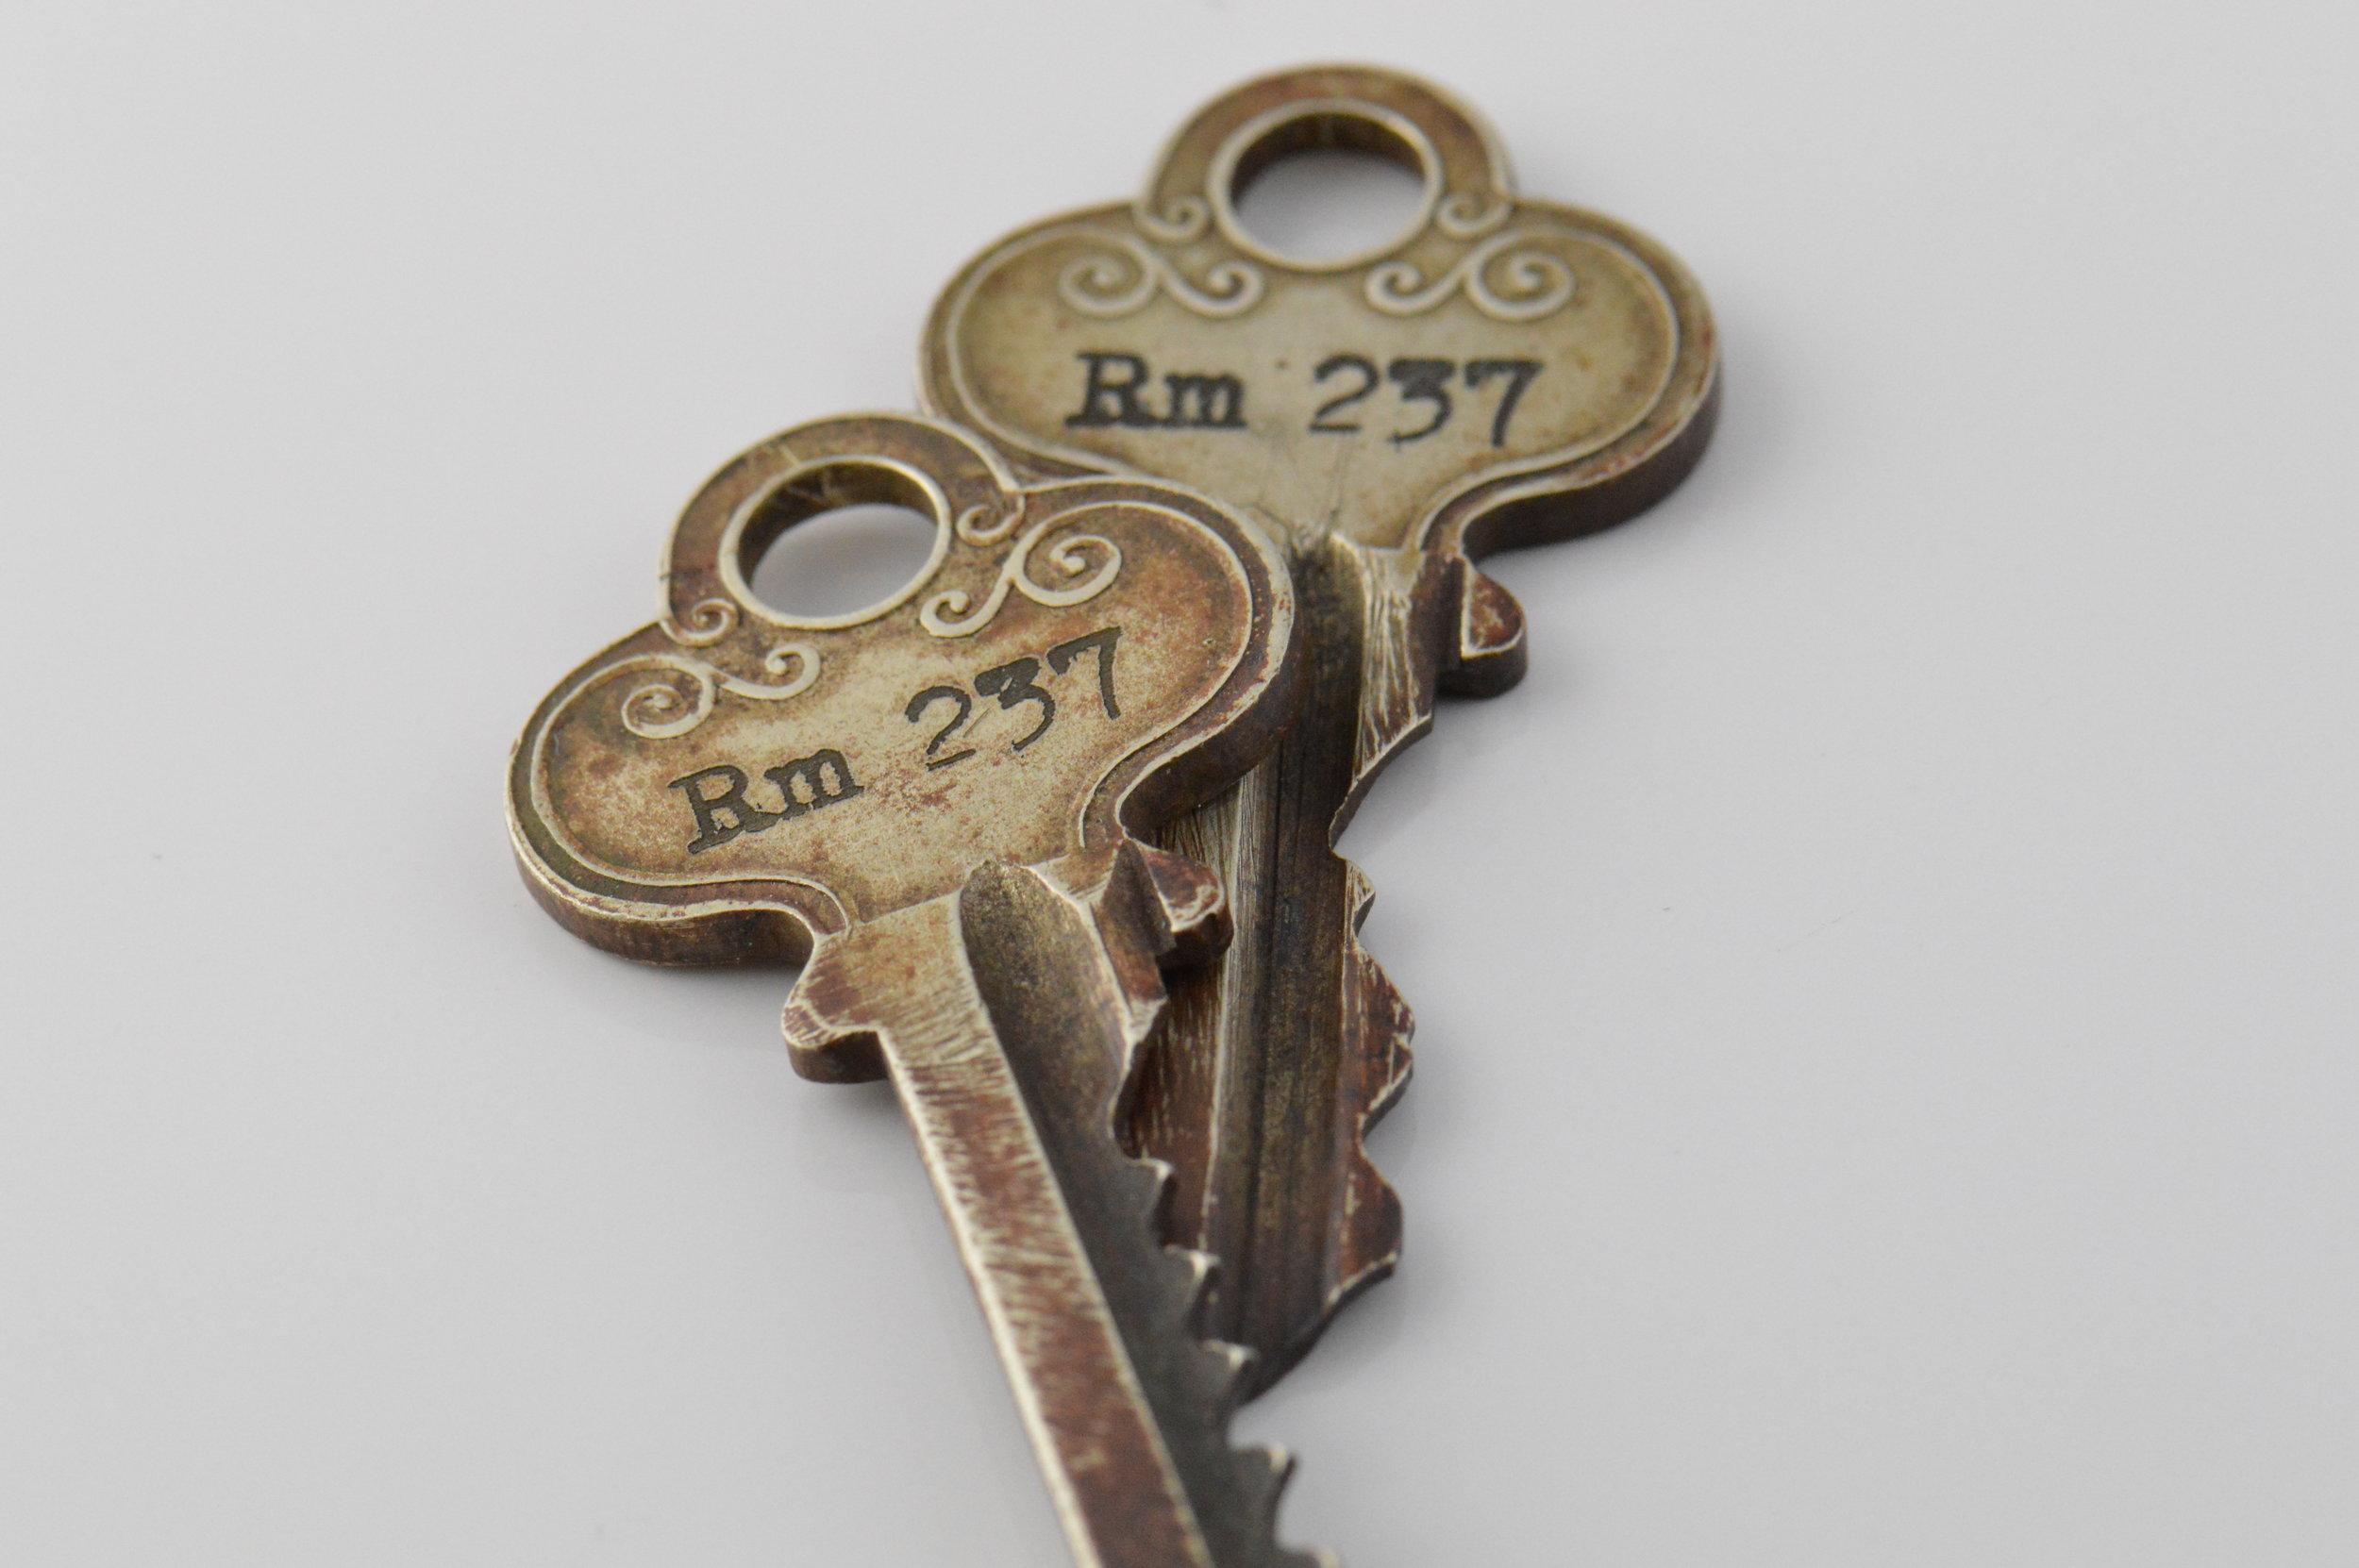 Homage to the Shining gift set of vintage room keys.